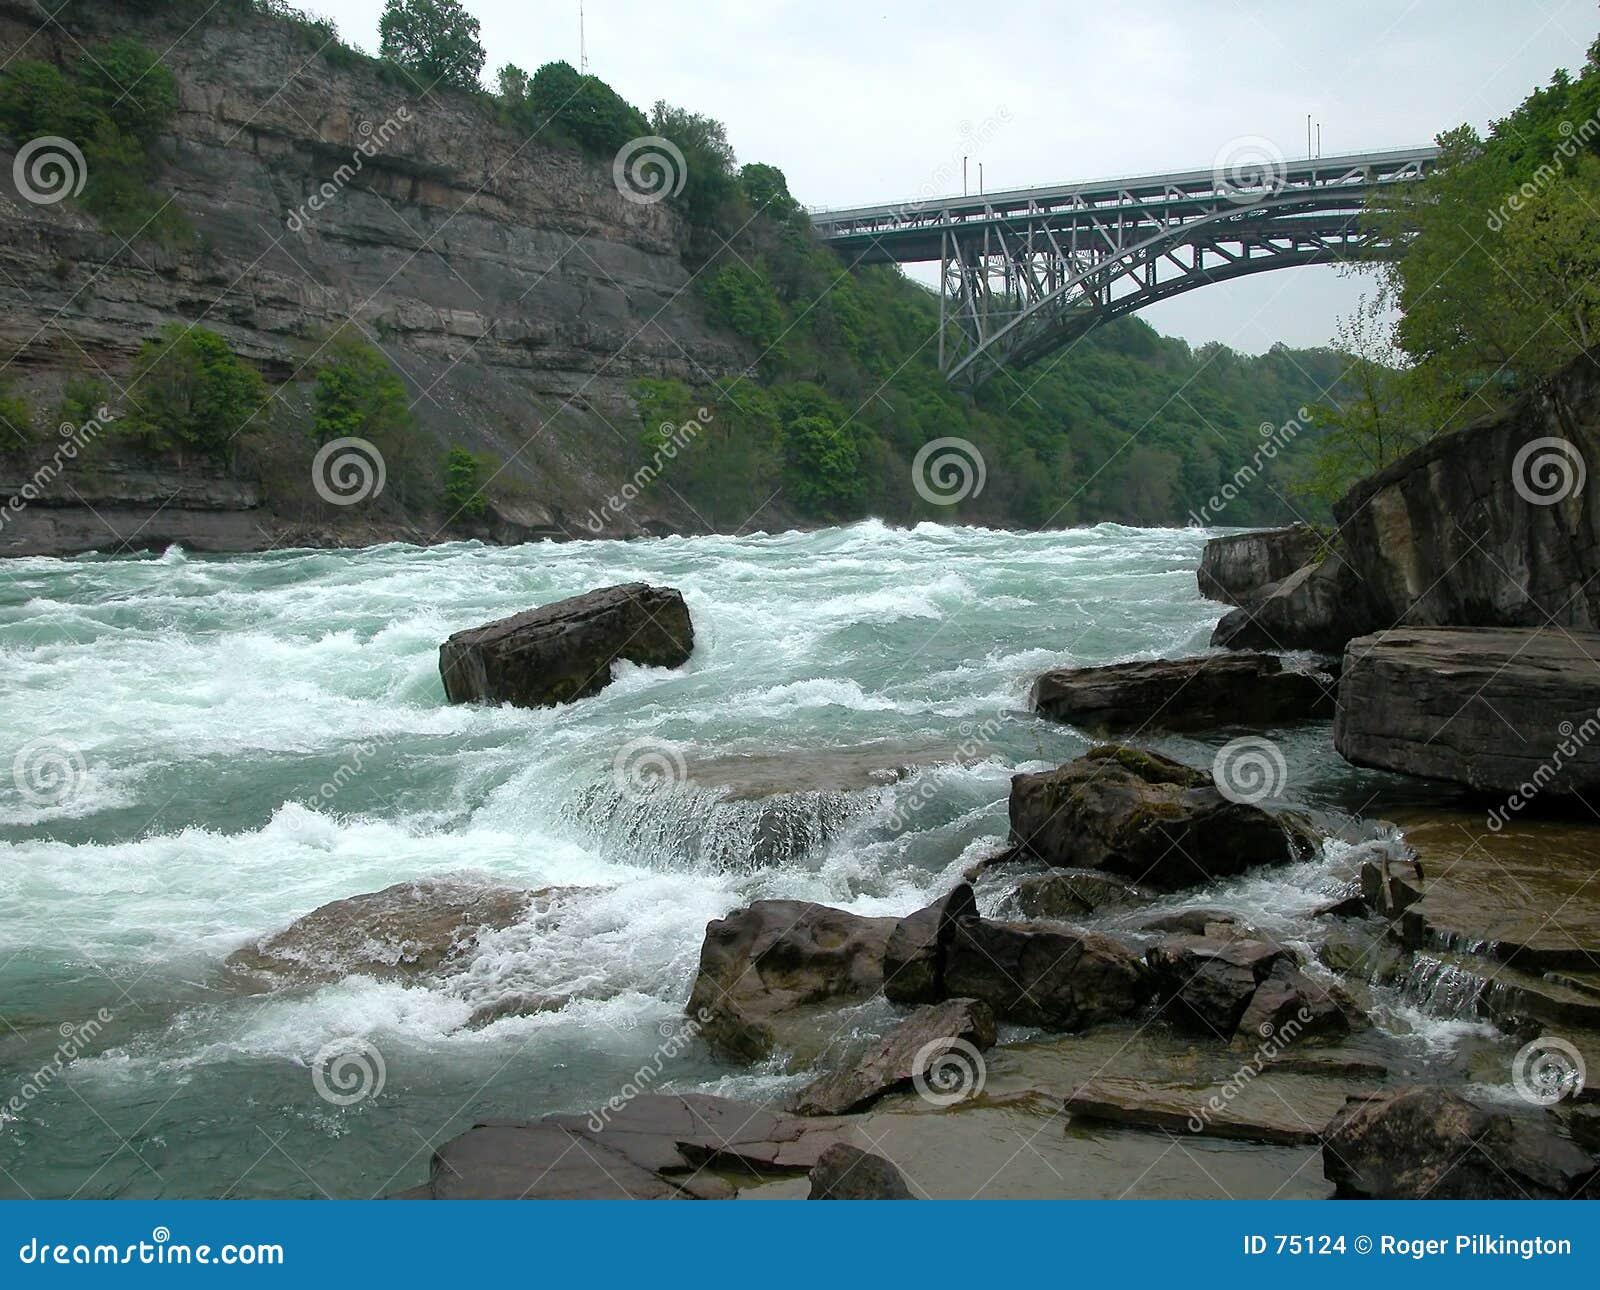 Whirlpool bridge.